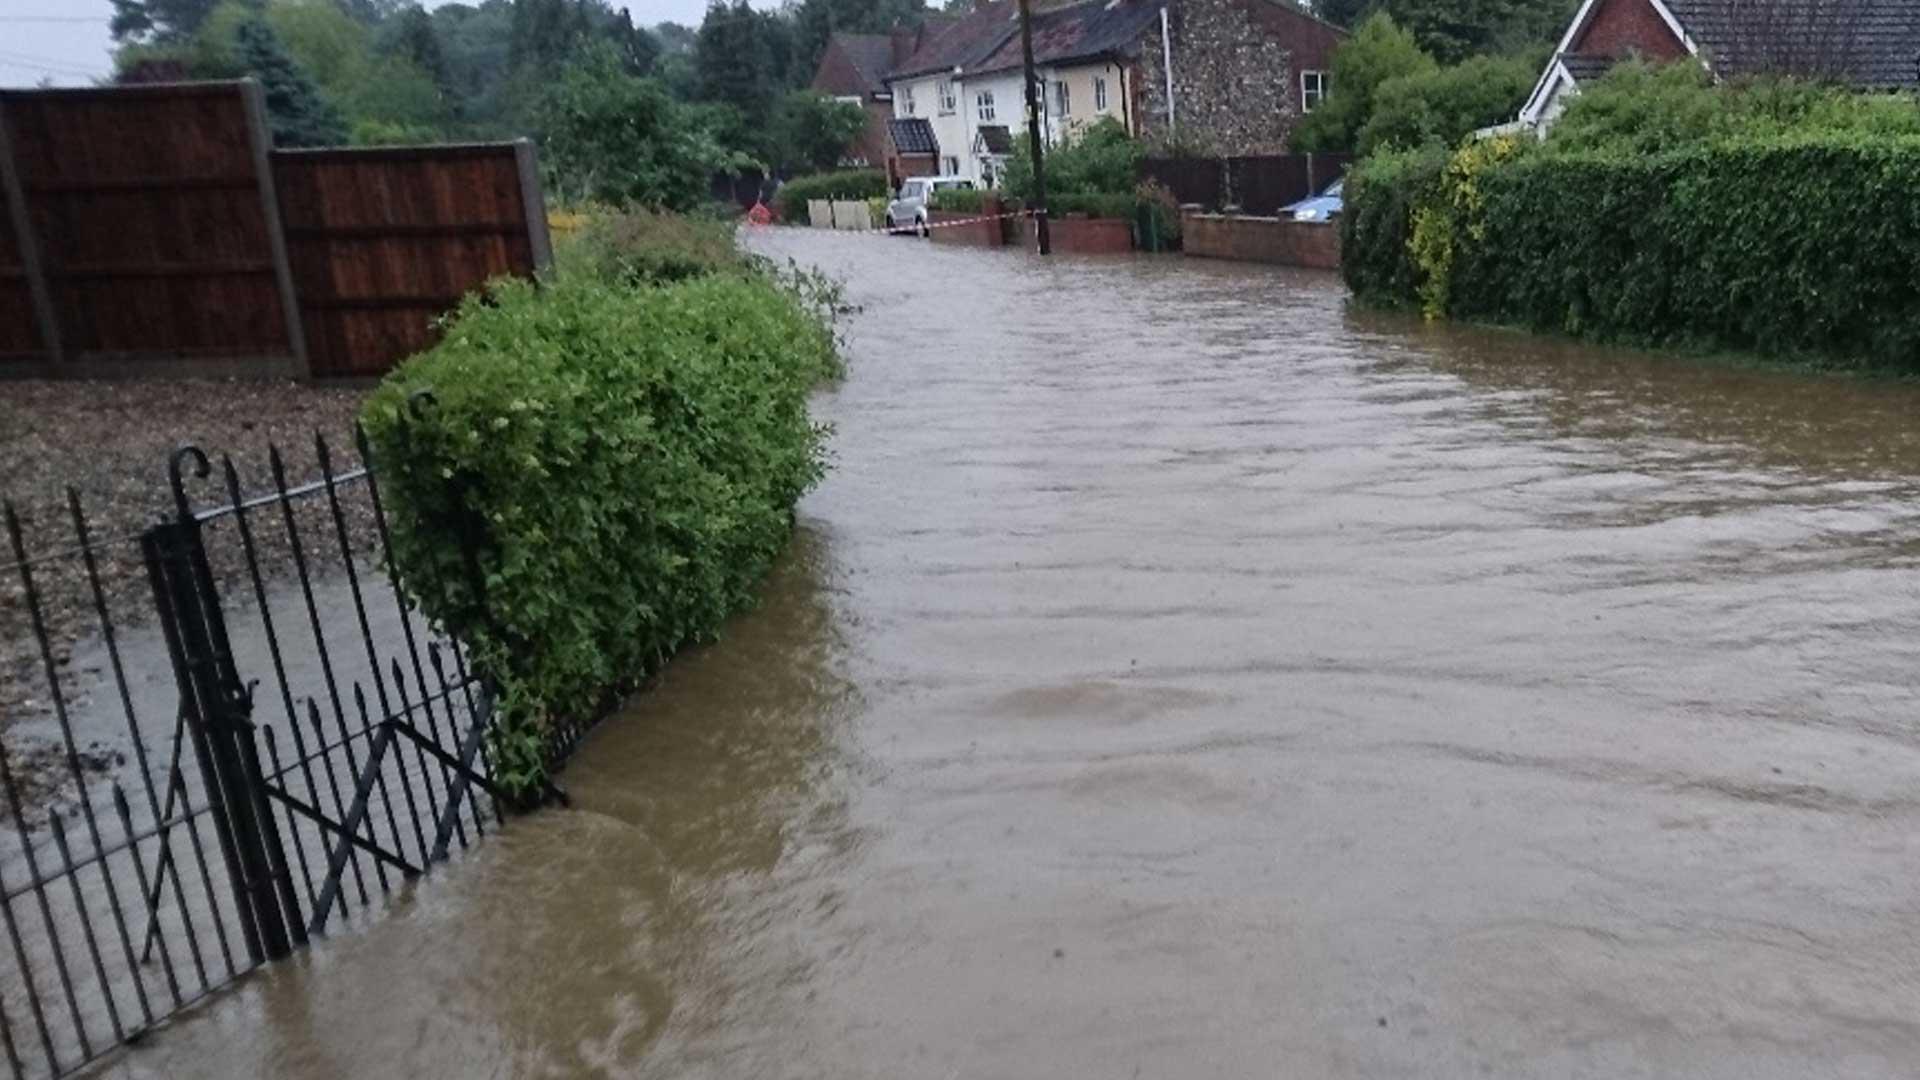 Chequers lane flooding Watton Saham